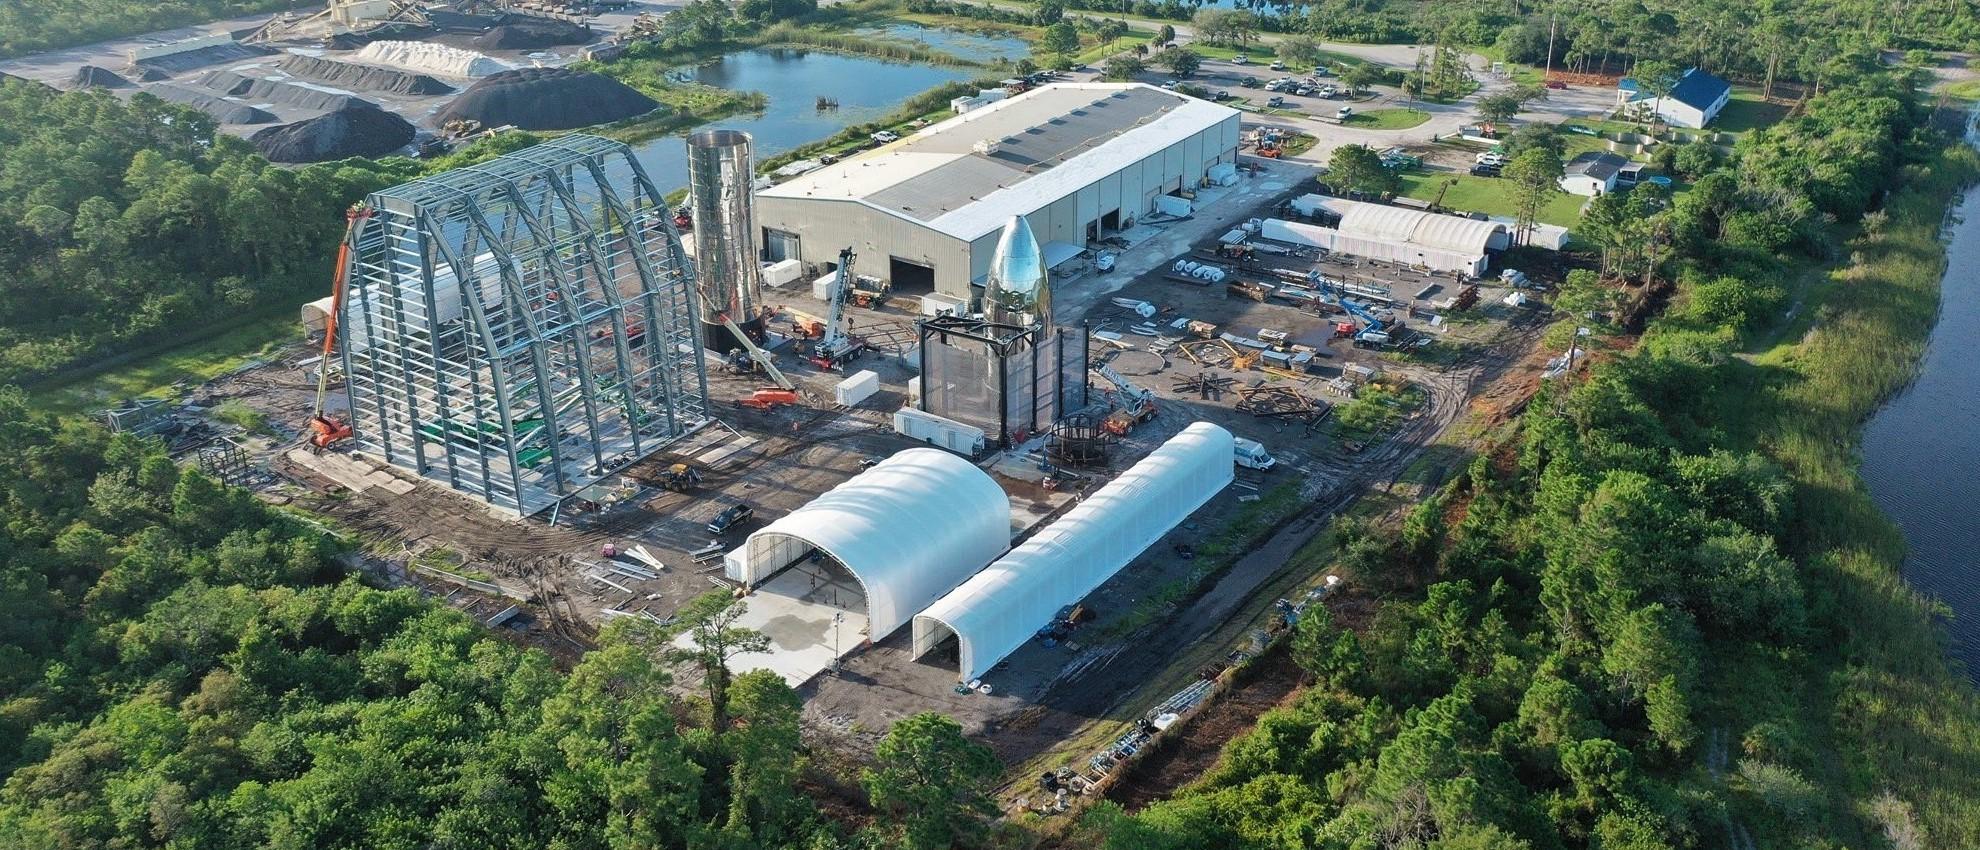 Florida orbital Starship prototype progress 080419 (Seamore Software) 1 crop